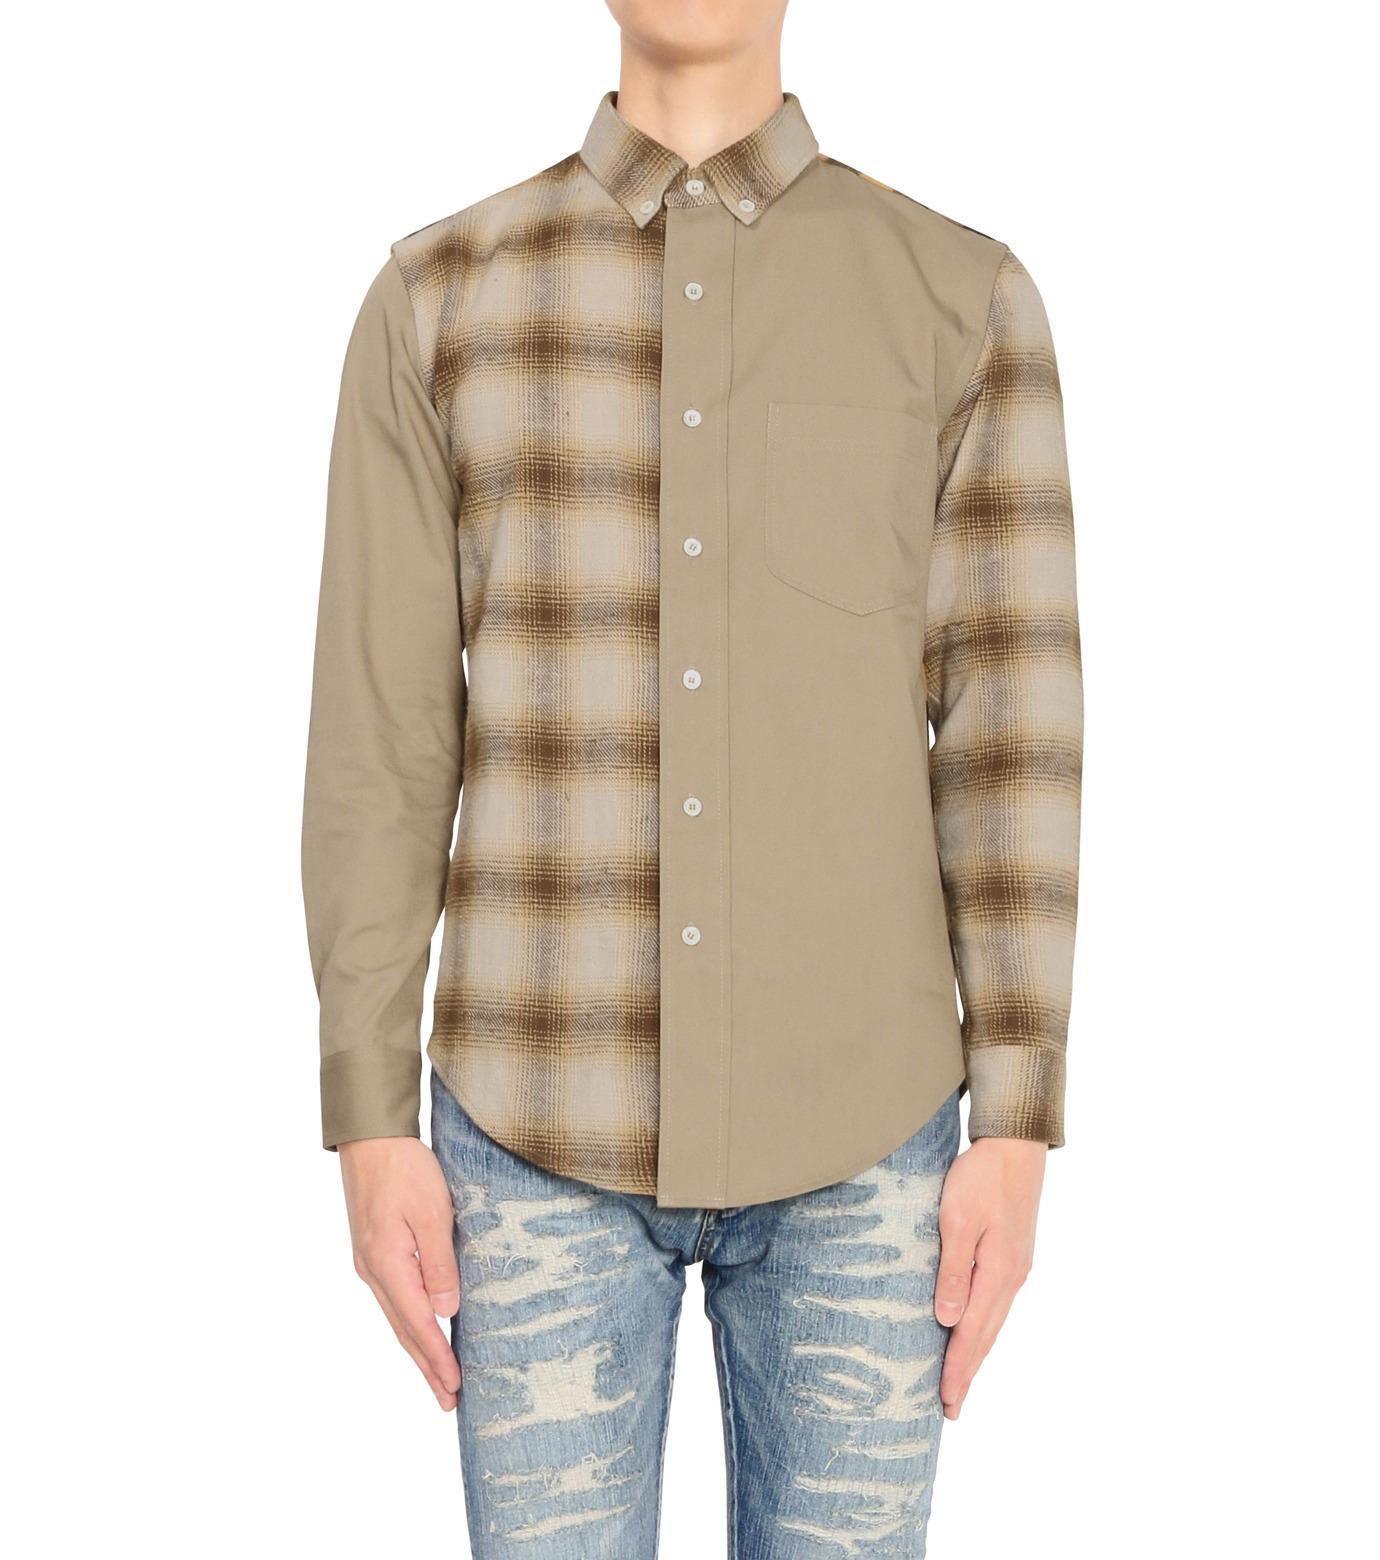 PALM ANGELS(パーム・エンジェルス)のPATCHWORK SHIRT-GREEN(シャツ/shirt)-6093055-22 拡大詳細画像1